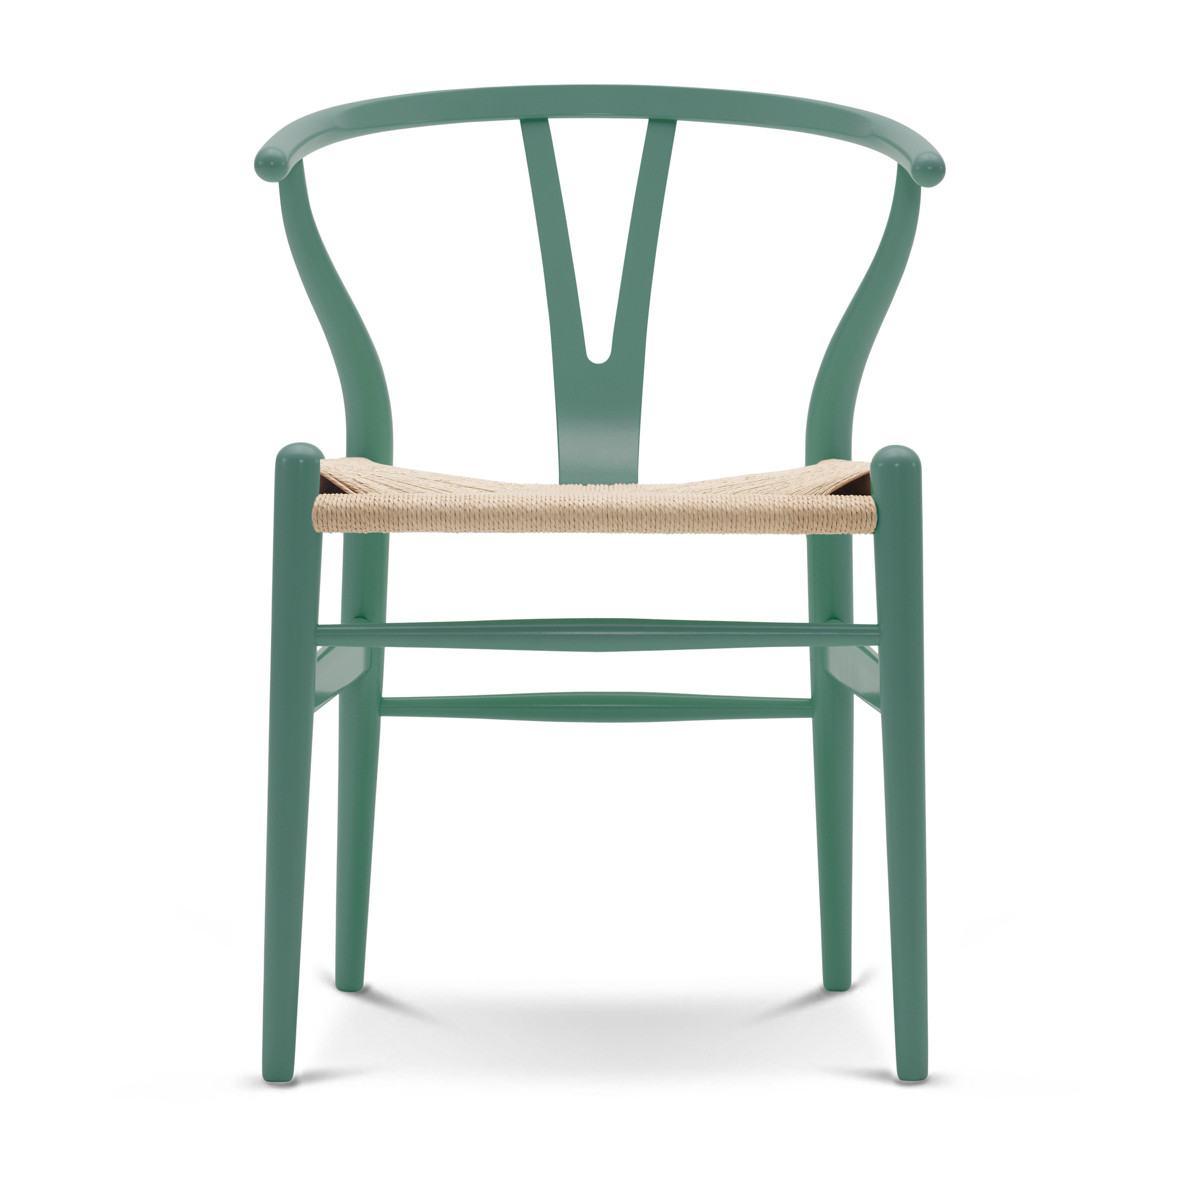 Carl Hansen CH24 Wishbone Chair - Painted Beech Frame